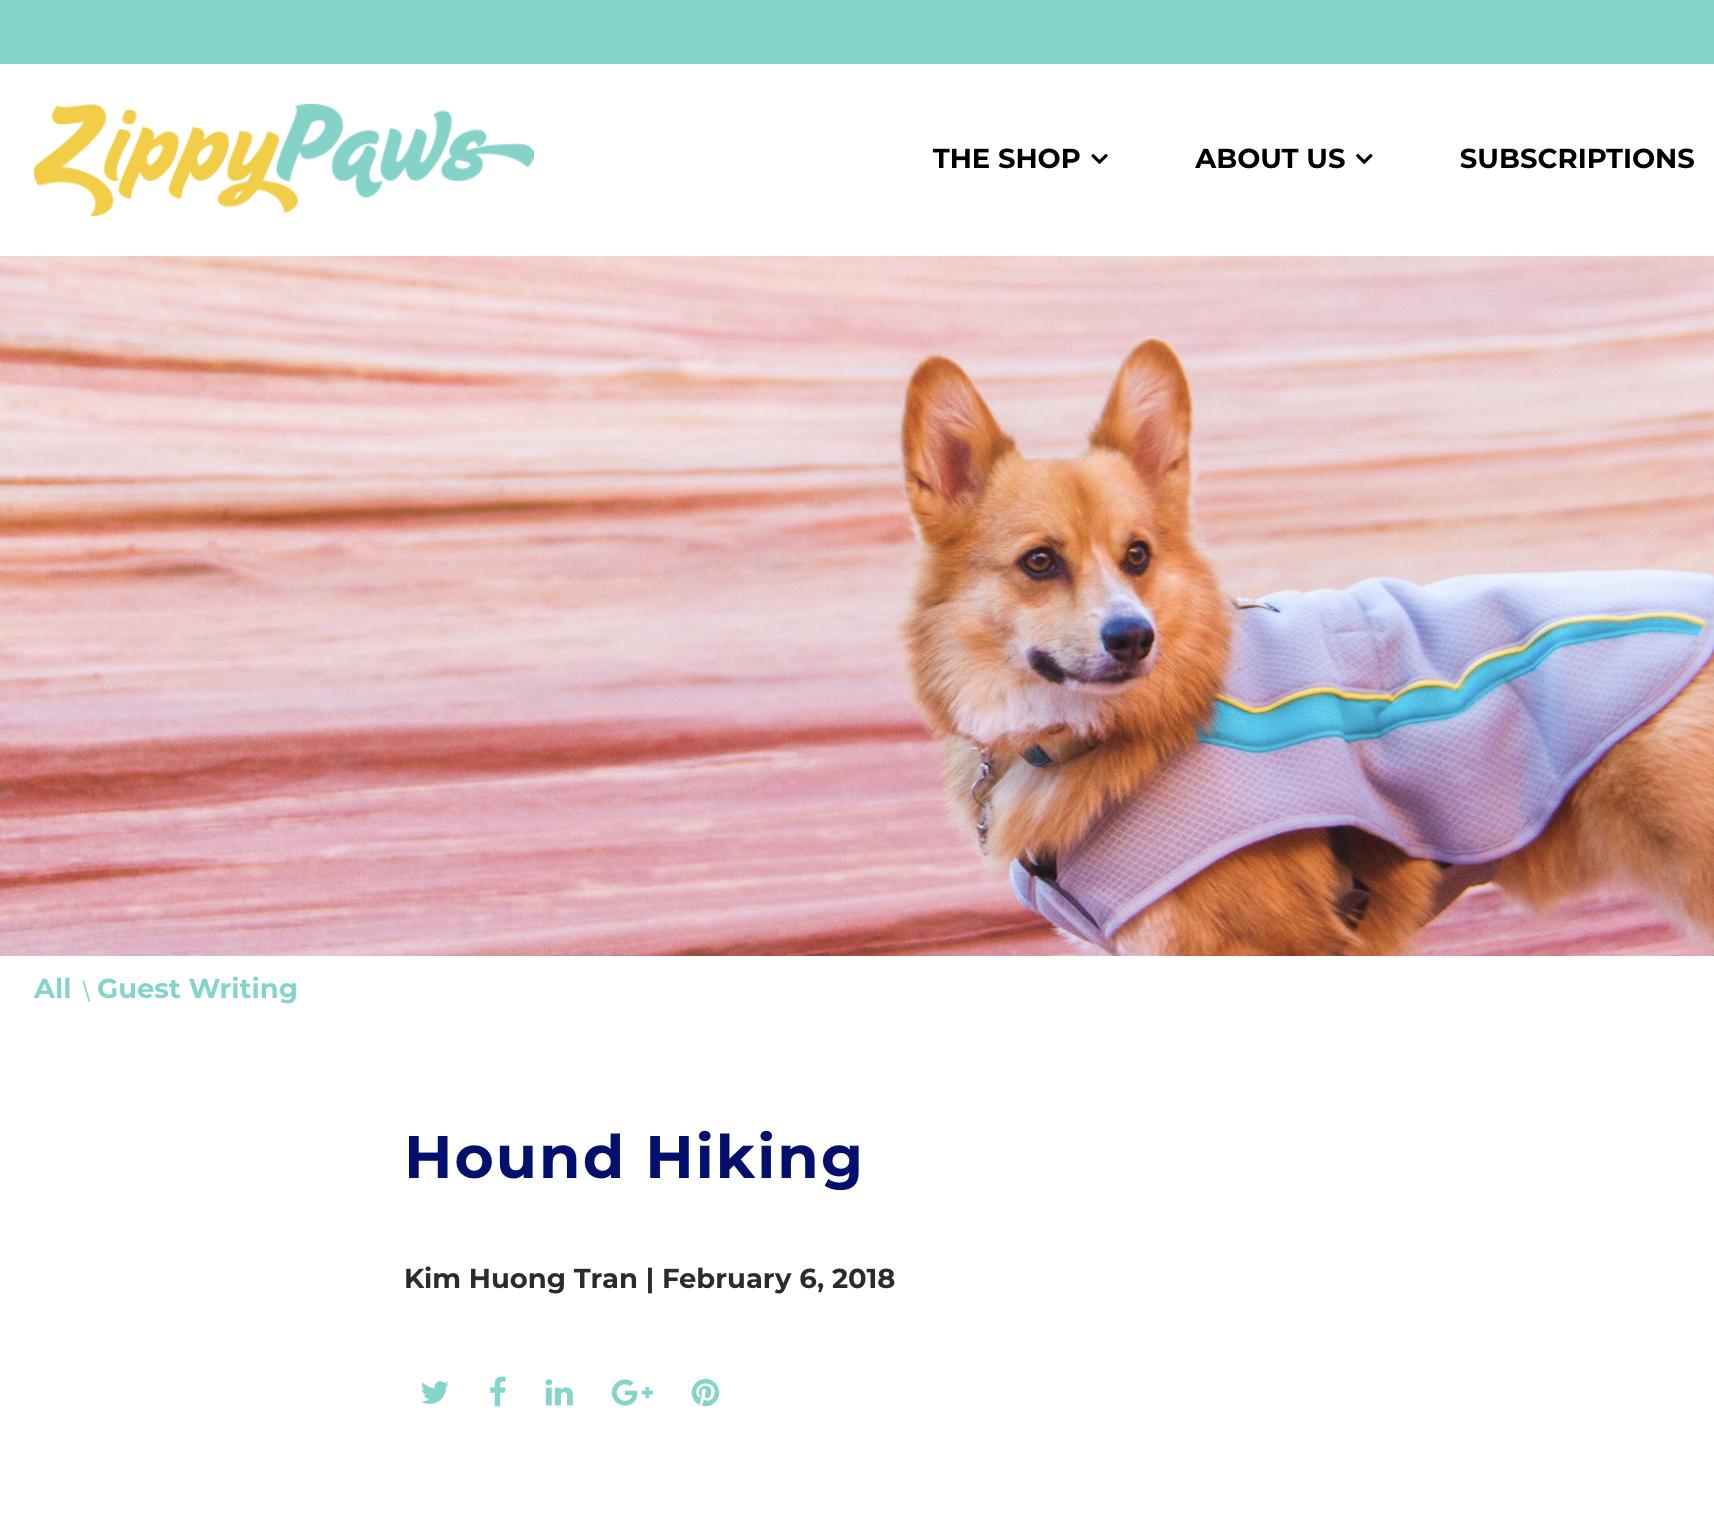 Zippy Paws:  Hound Hiking